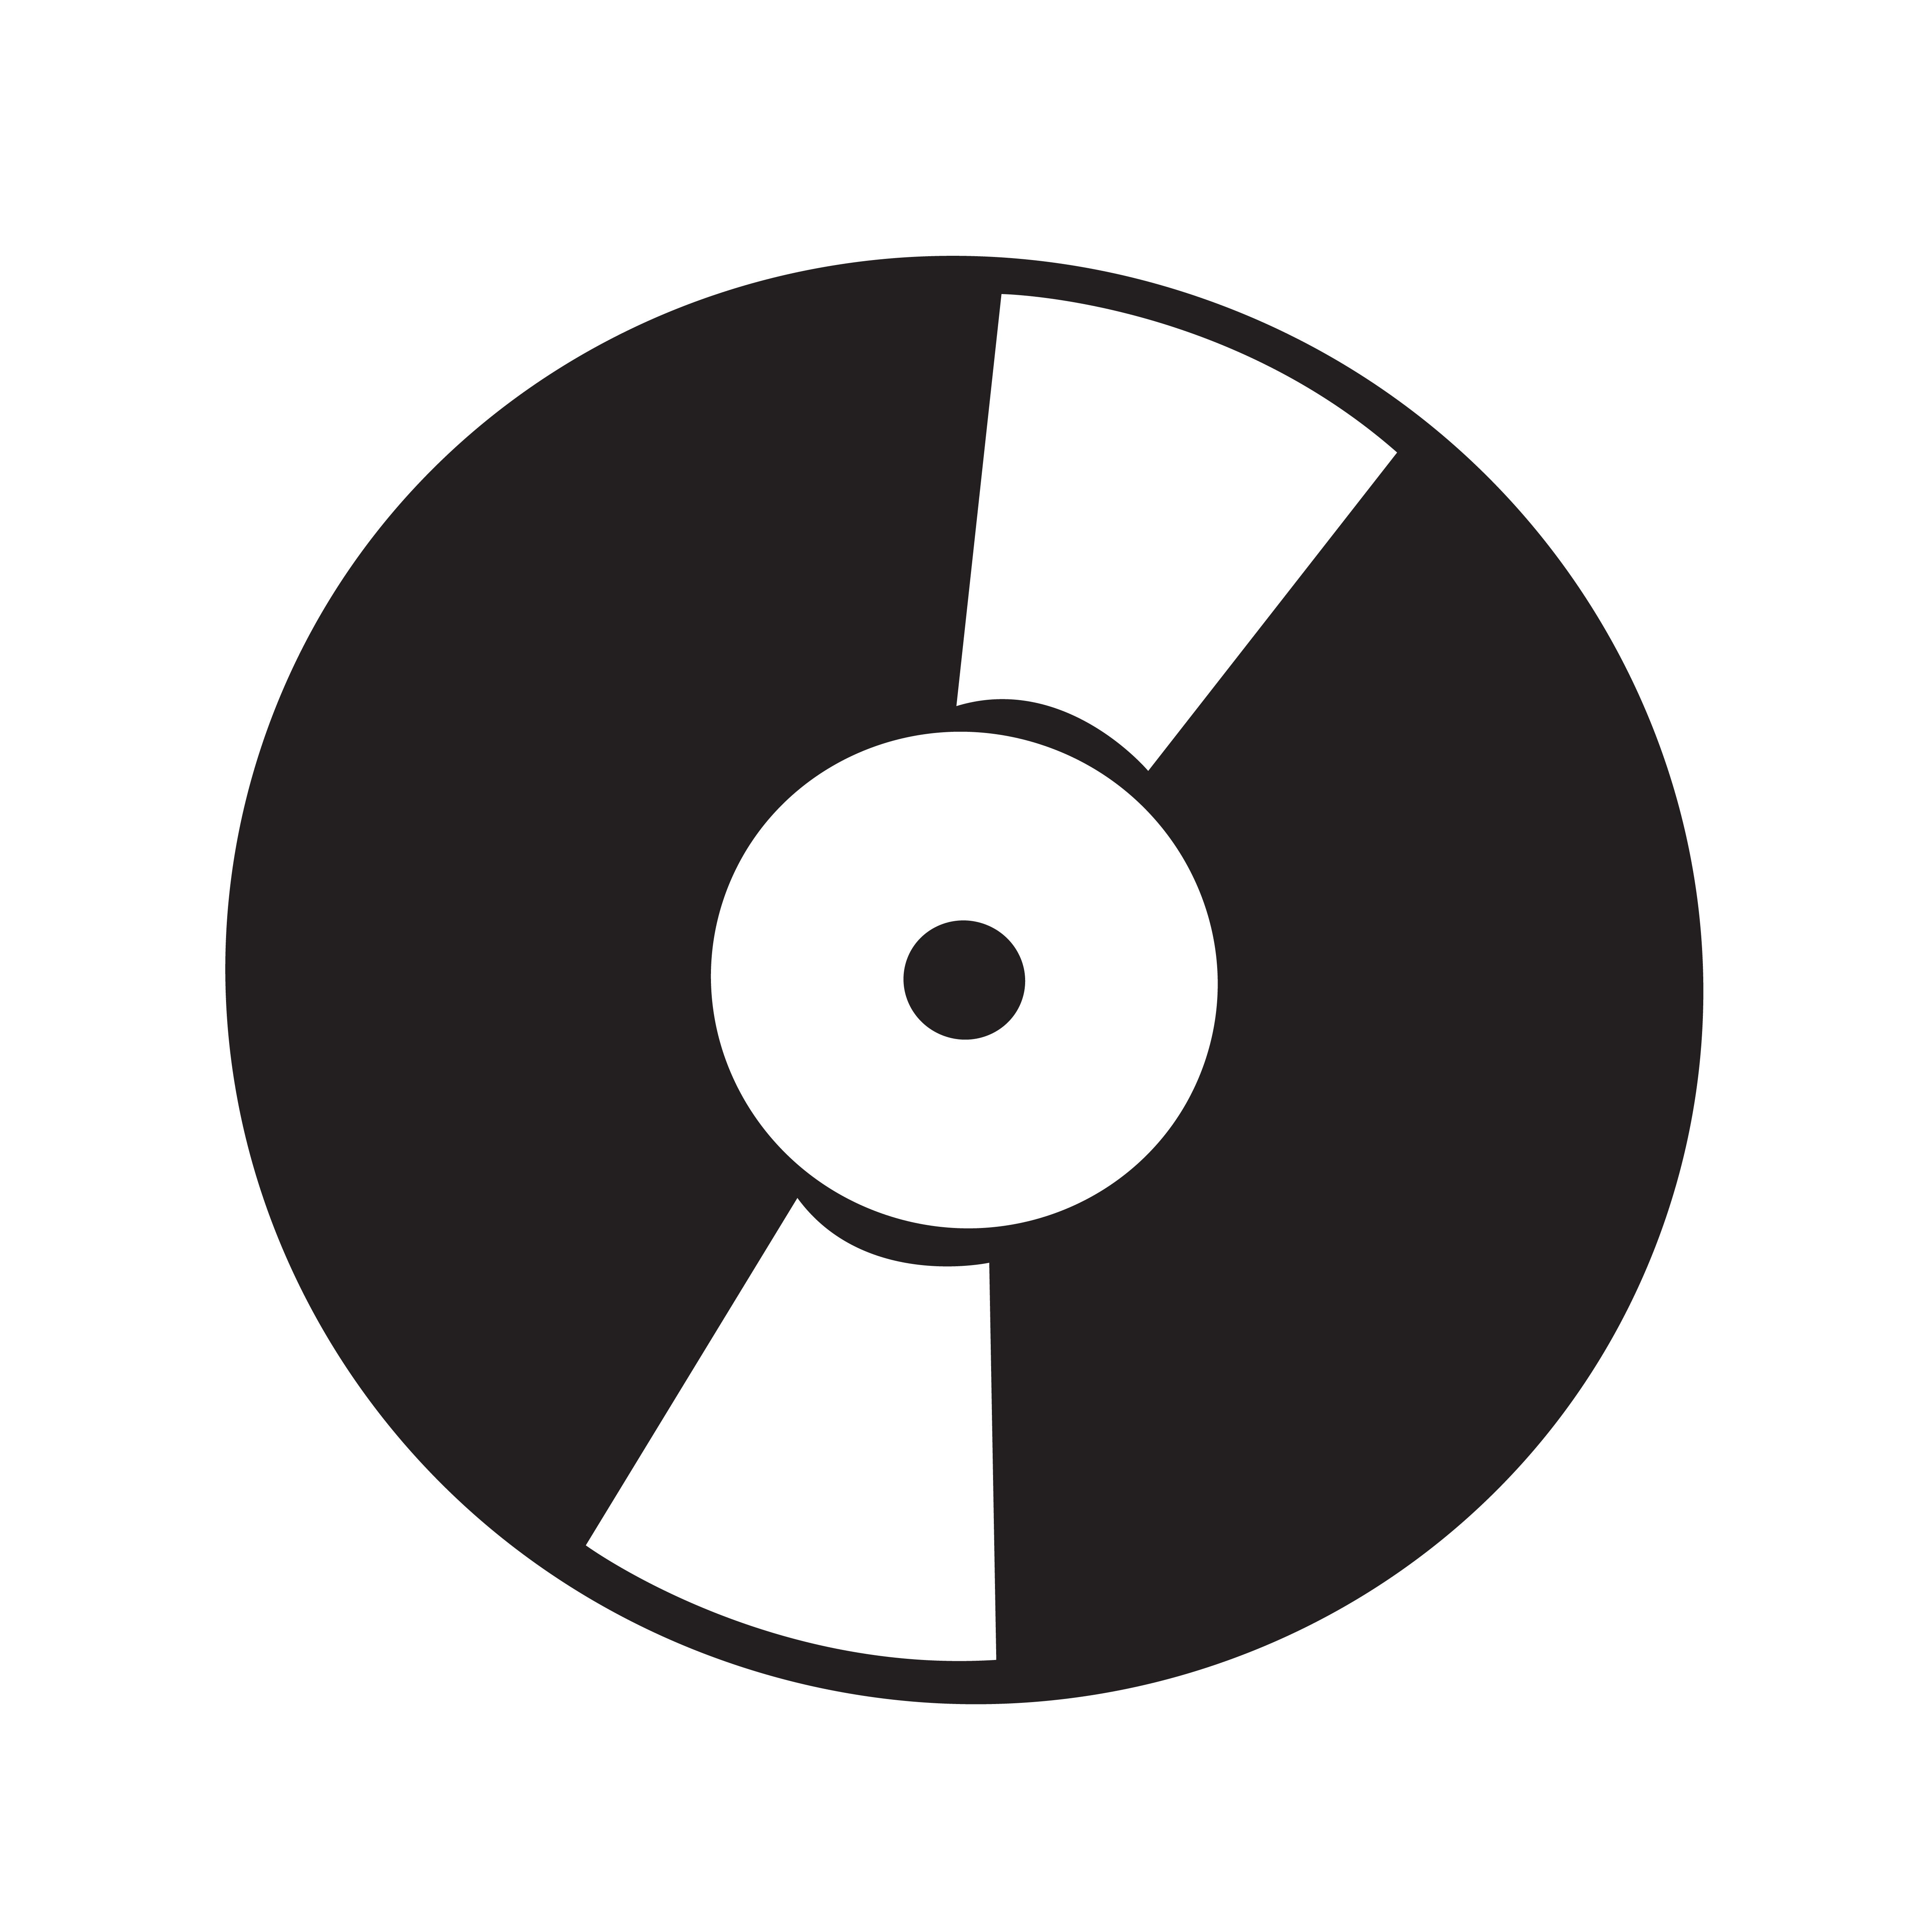 Retro Vinyl Record Icon Vector Illustration Download